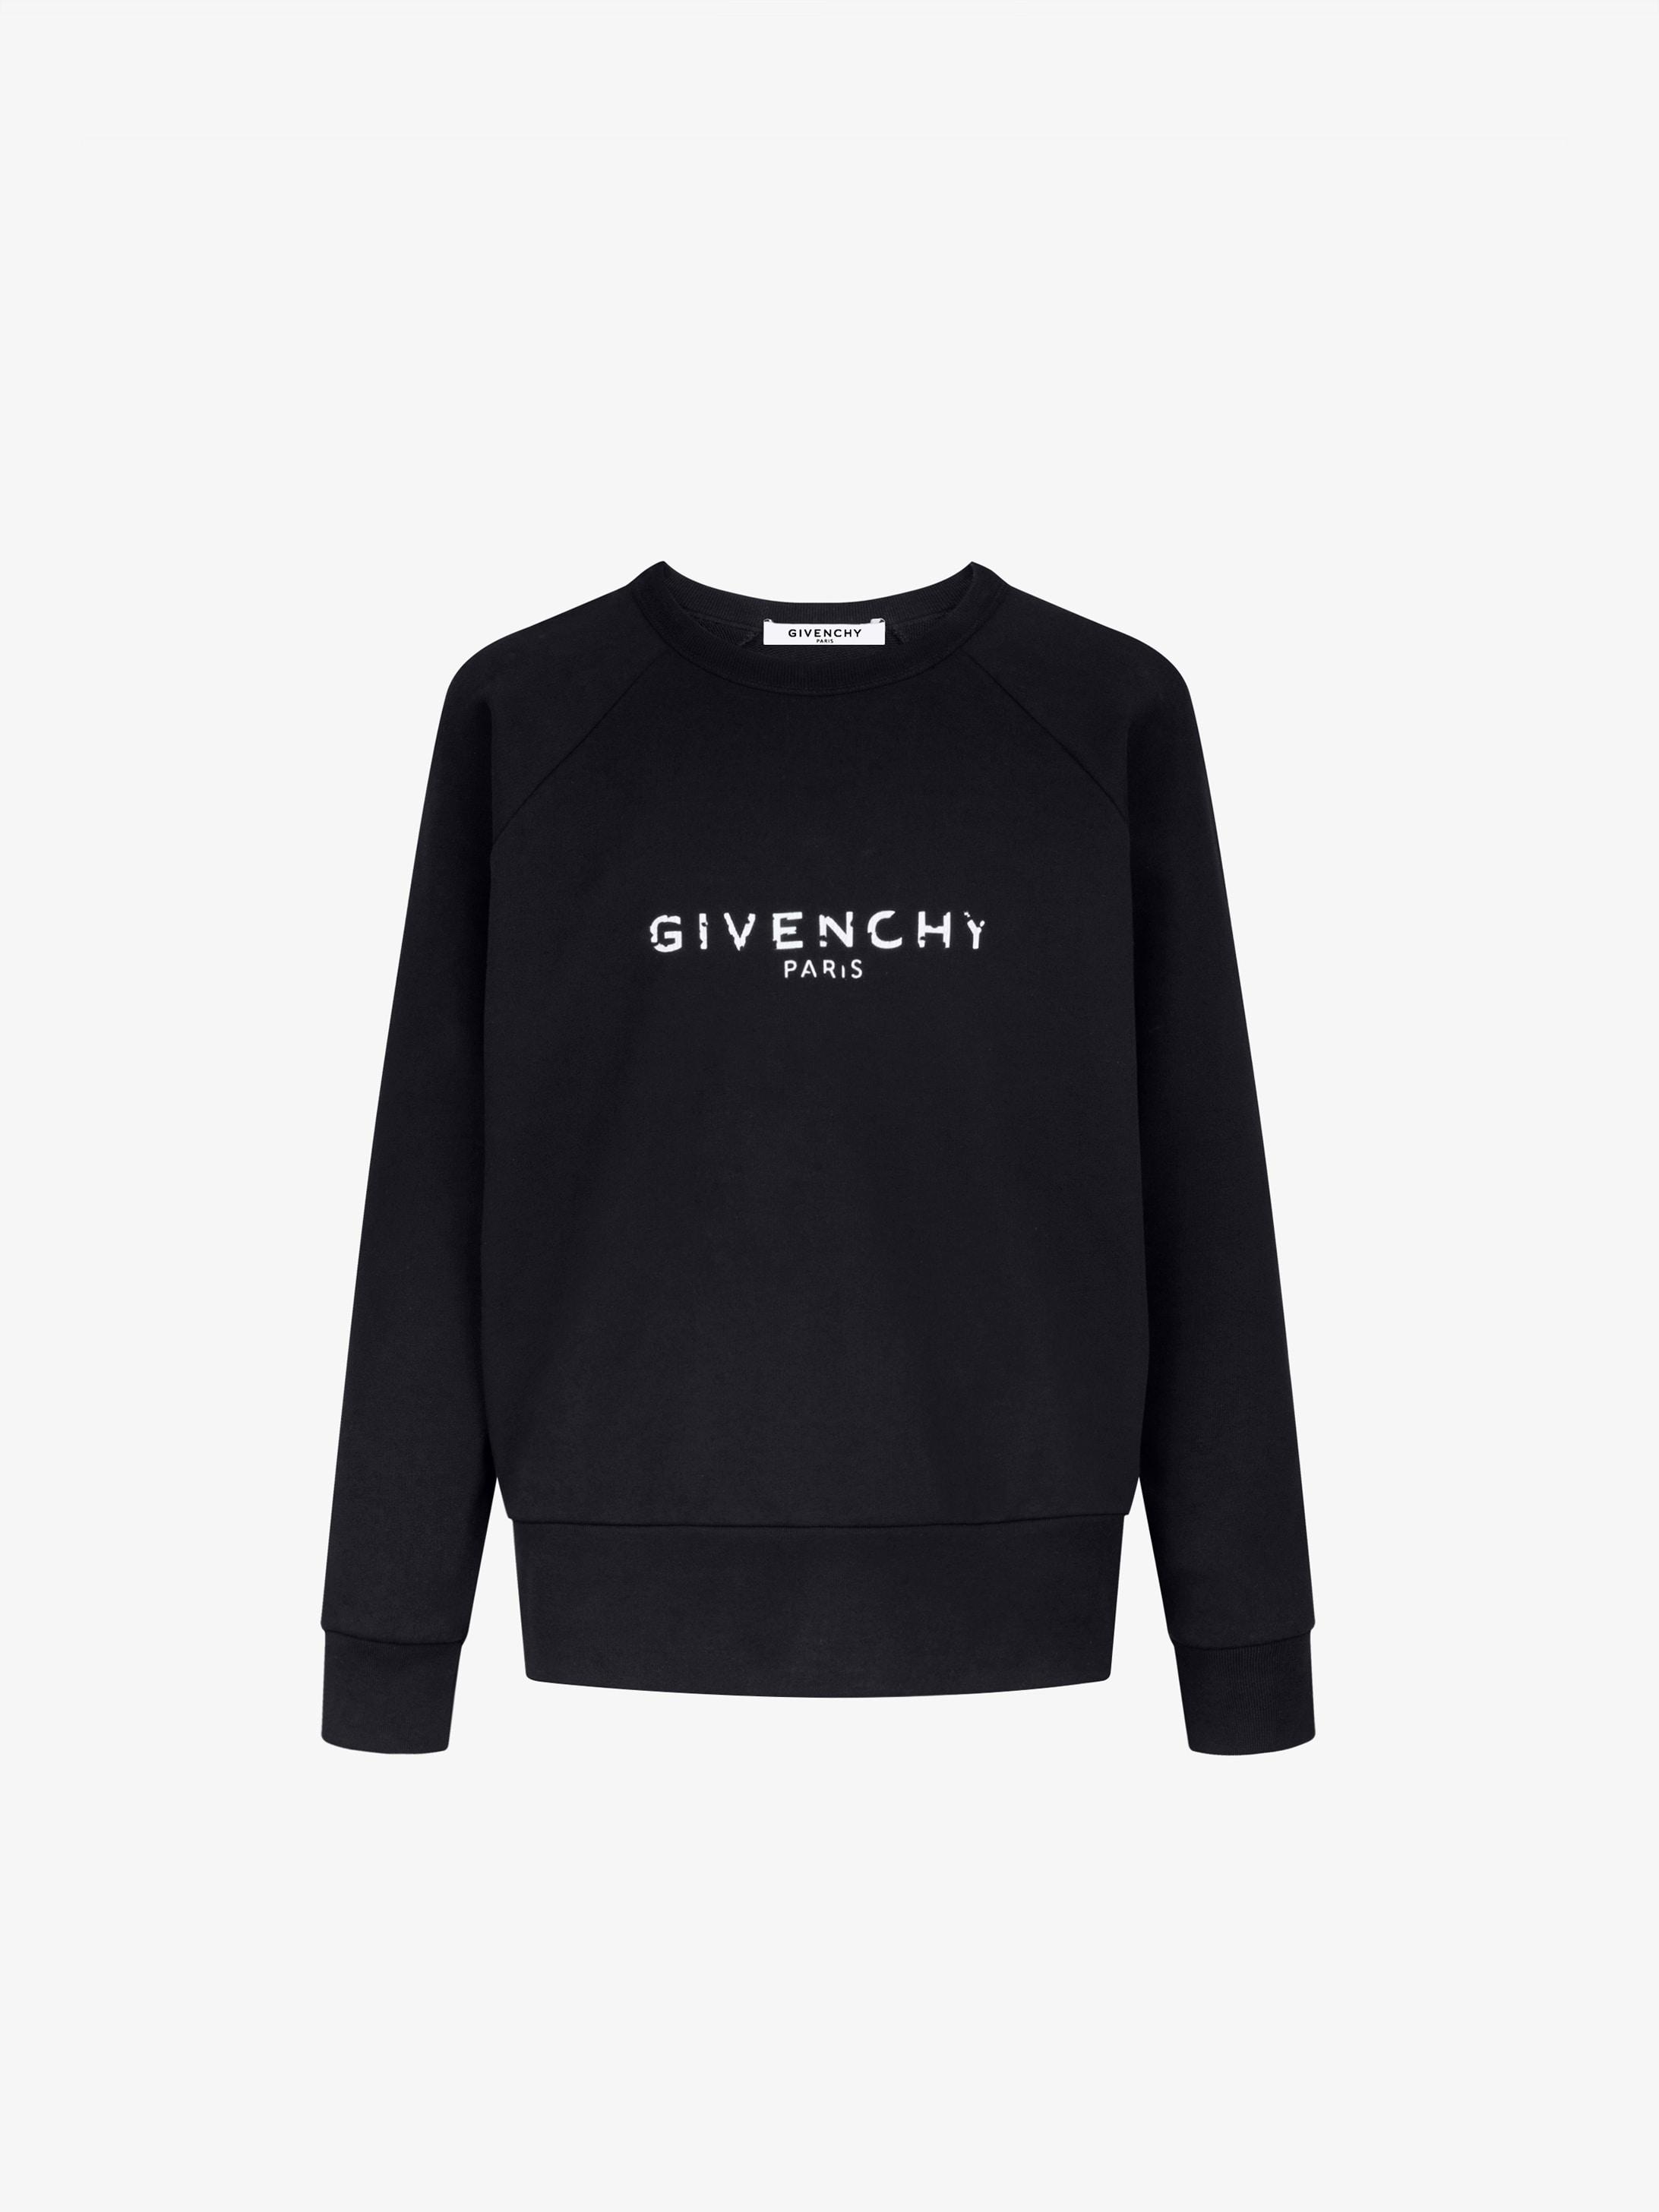 Blurred GIVENCHY PARIS sweatshirt